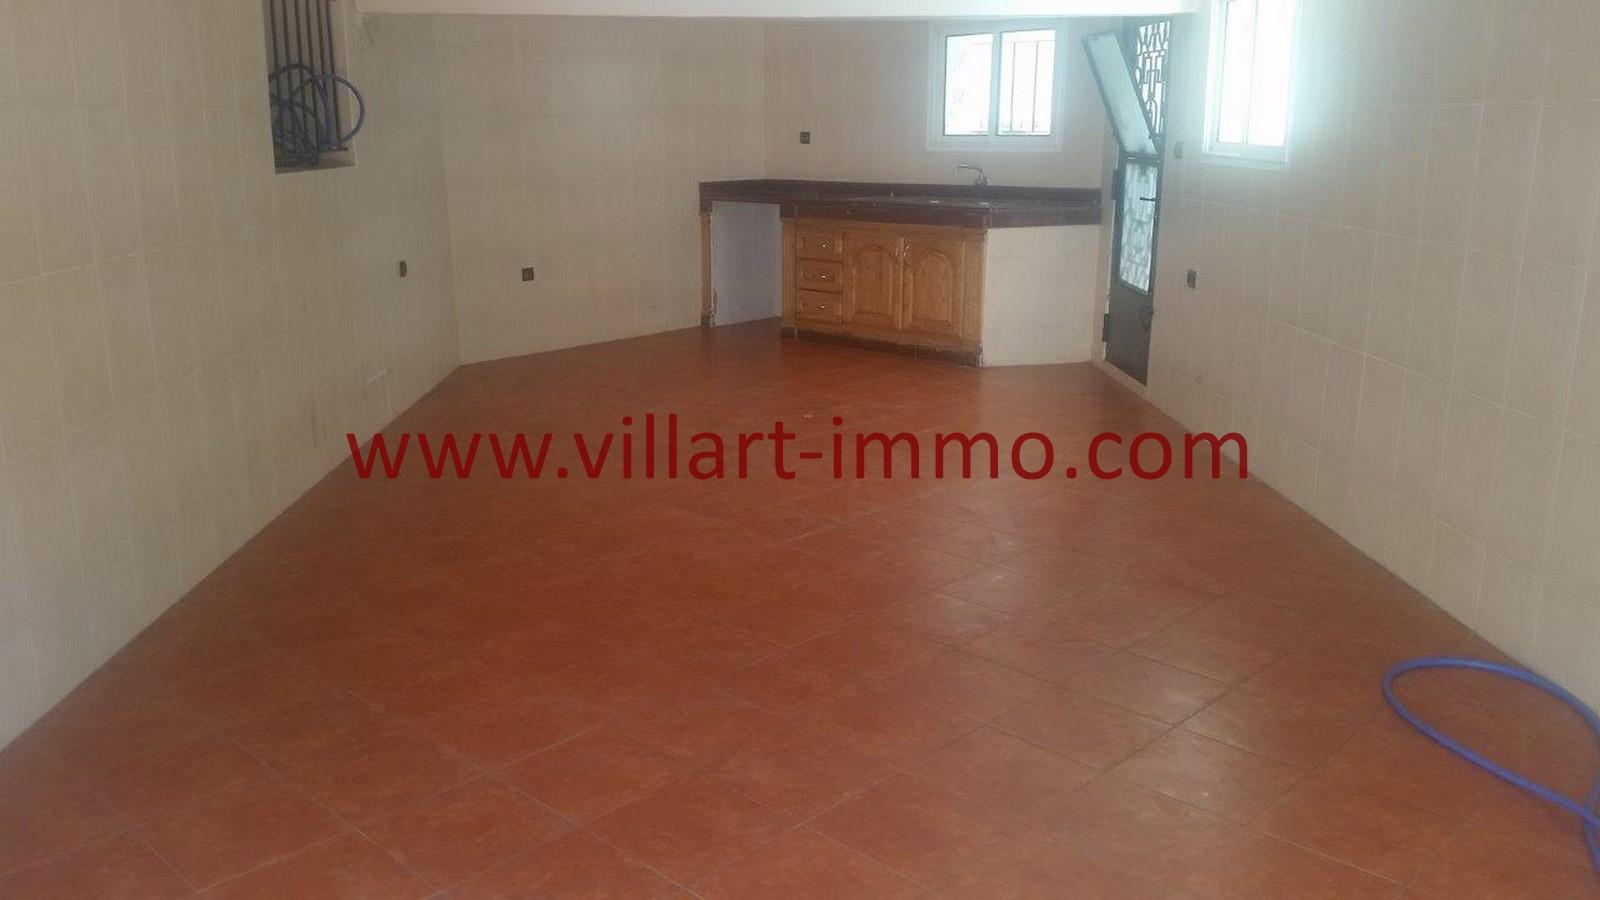 12-a-louer-villa-non-meuble-tanger-cuisine-lv967-villart-immo